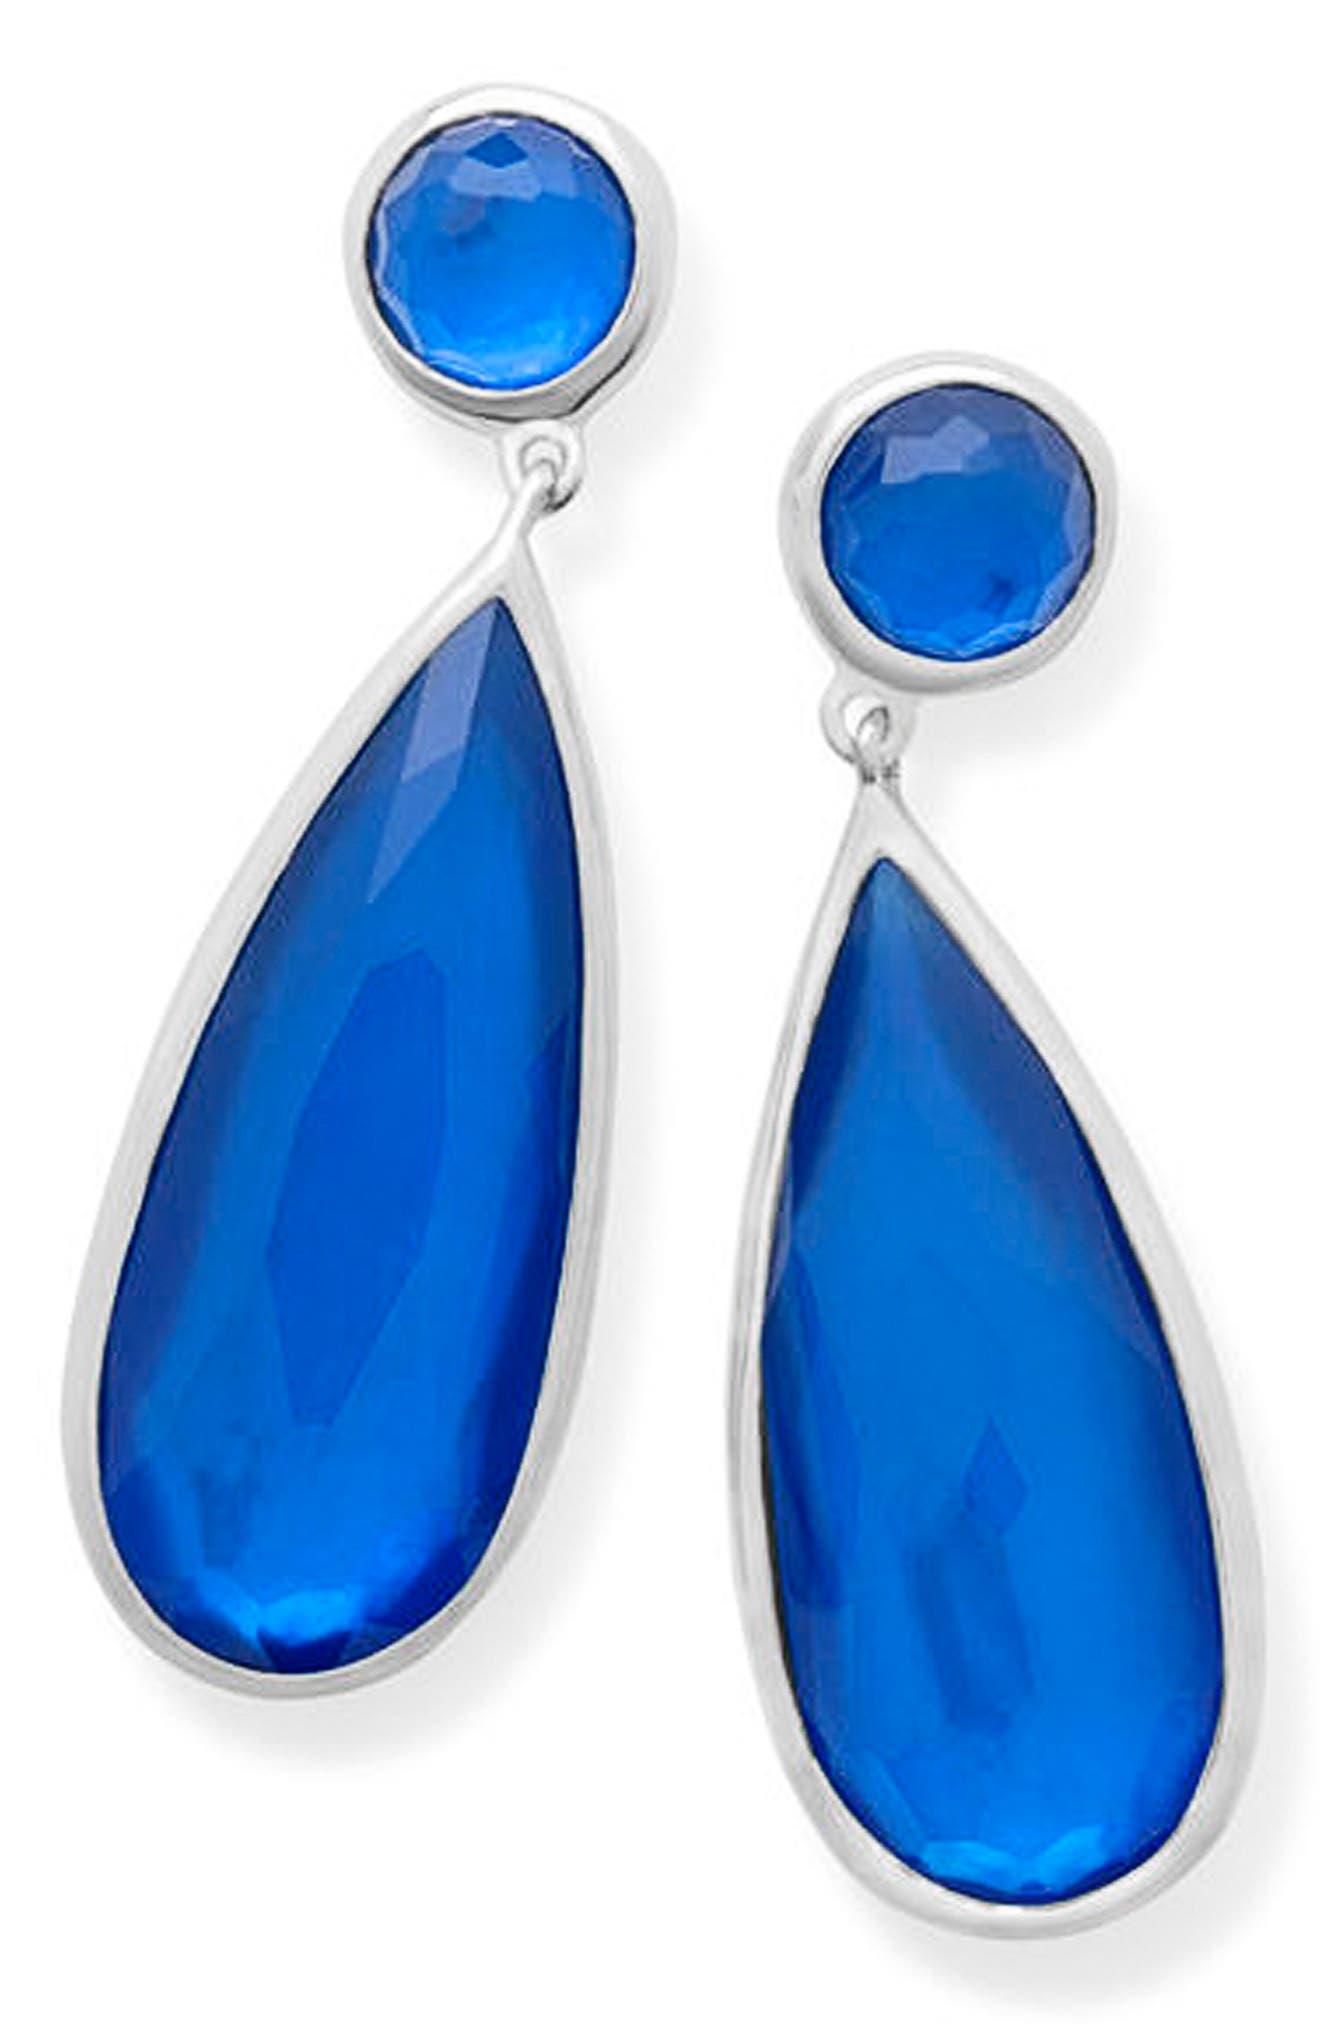 Wonderland Teardrop Earrings,                         Main,                         color, 400